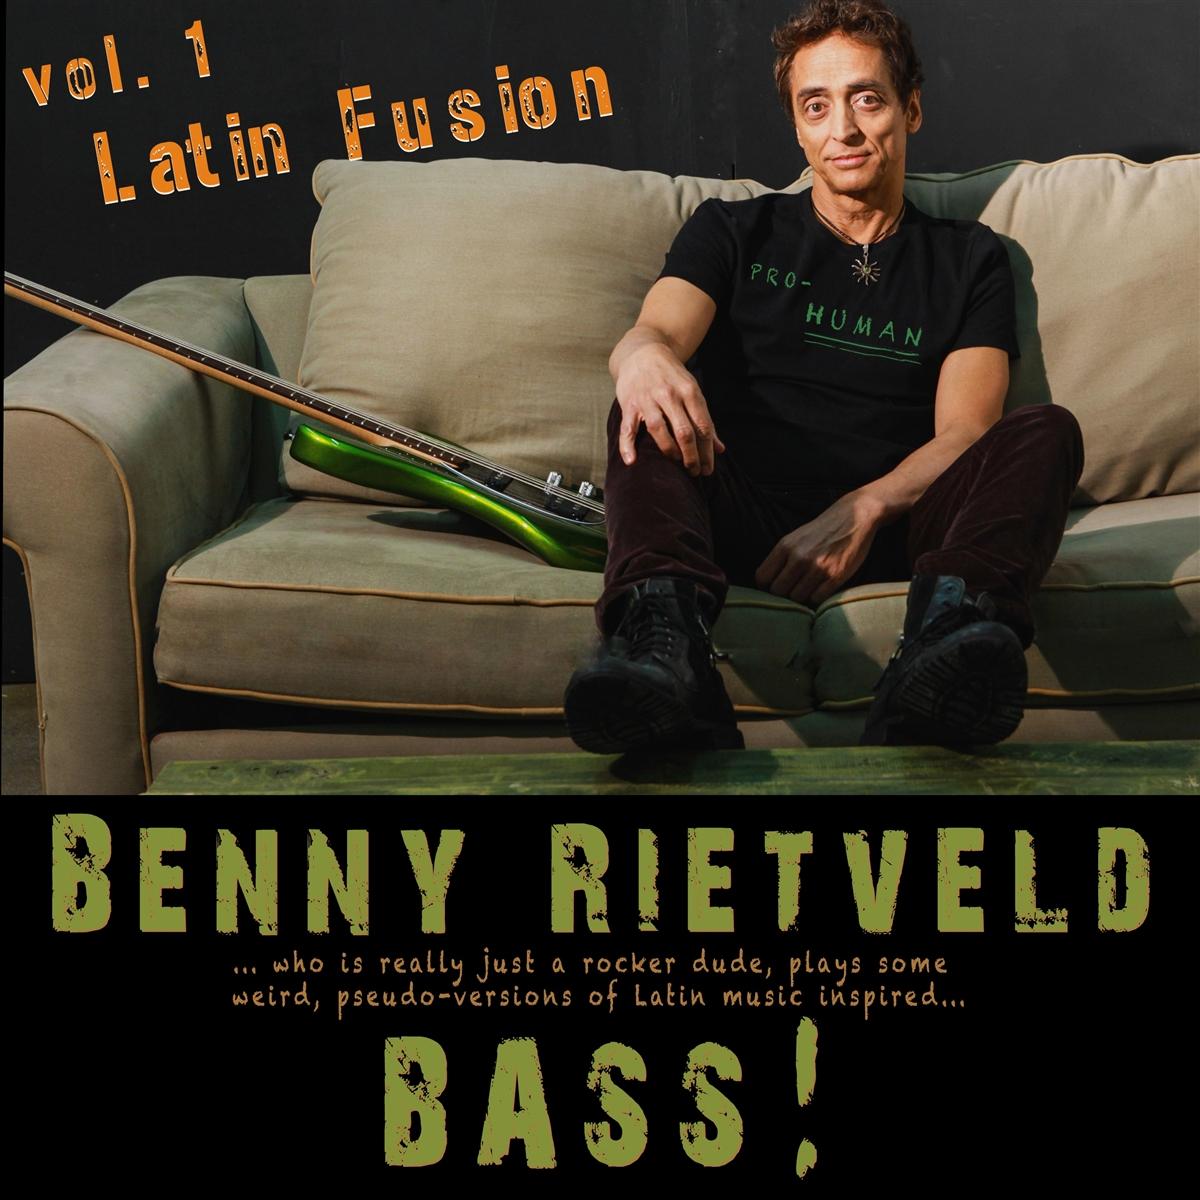 BENNY RIETVELD BASS LATIN FUSION VOL. 1